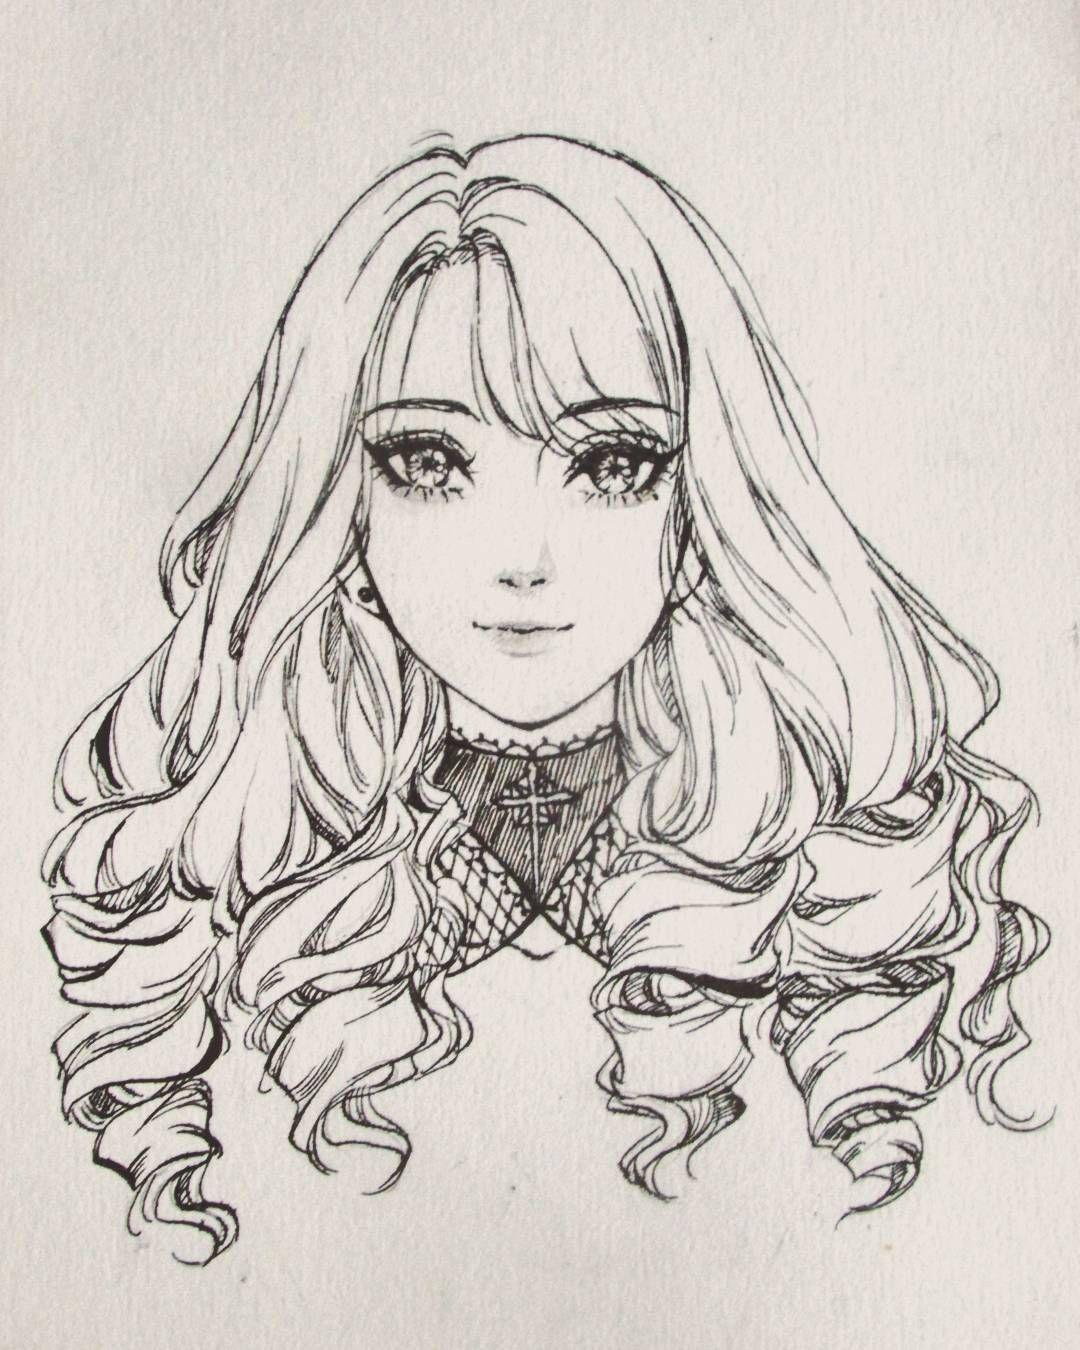 "10.6k Likes, 42 Comments - Myzucass (@cassmyzu) on Instagram: ""Sick enough to die😷🚑🏥 #mangadraw #mangadrawing #mangasketch #animesketch #animedraw #animedrawing…"""